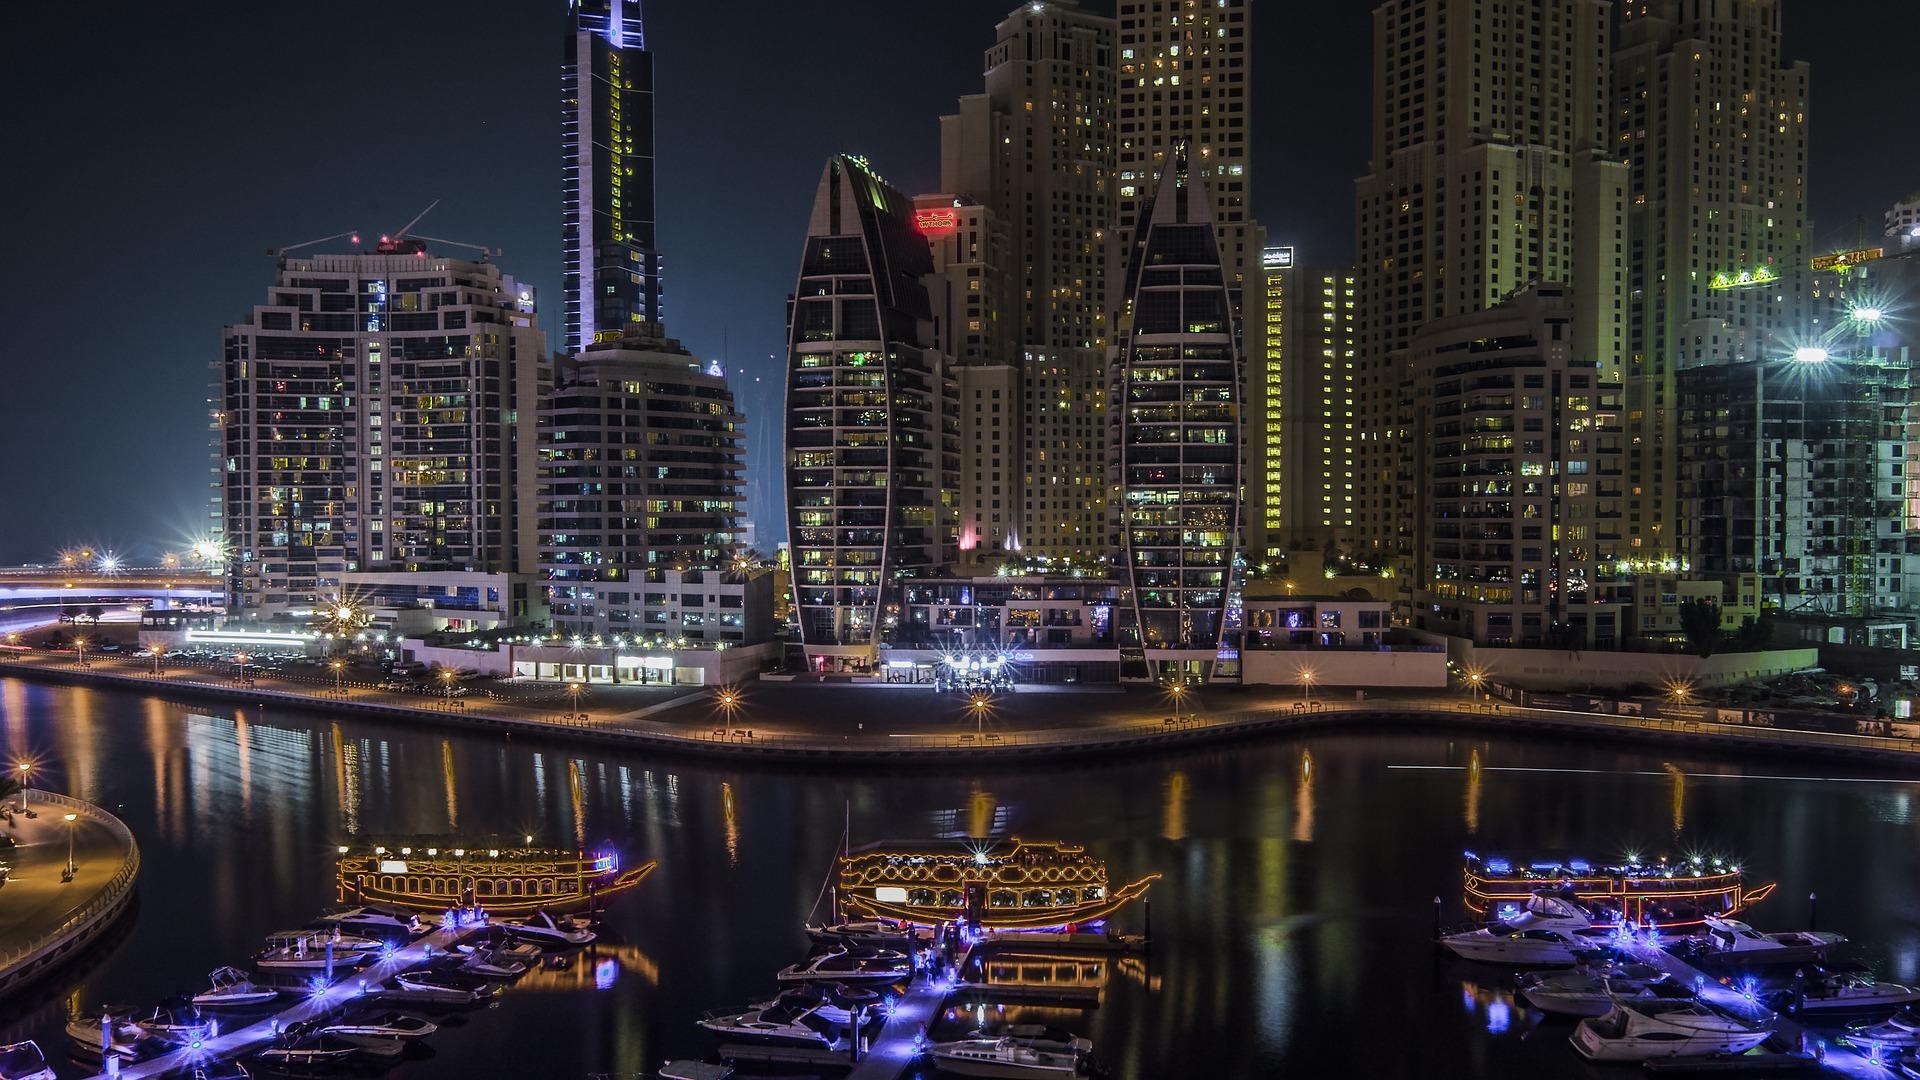 Image of the Dubai, UAE marina at night